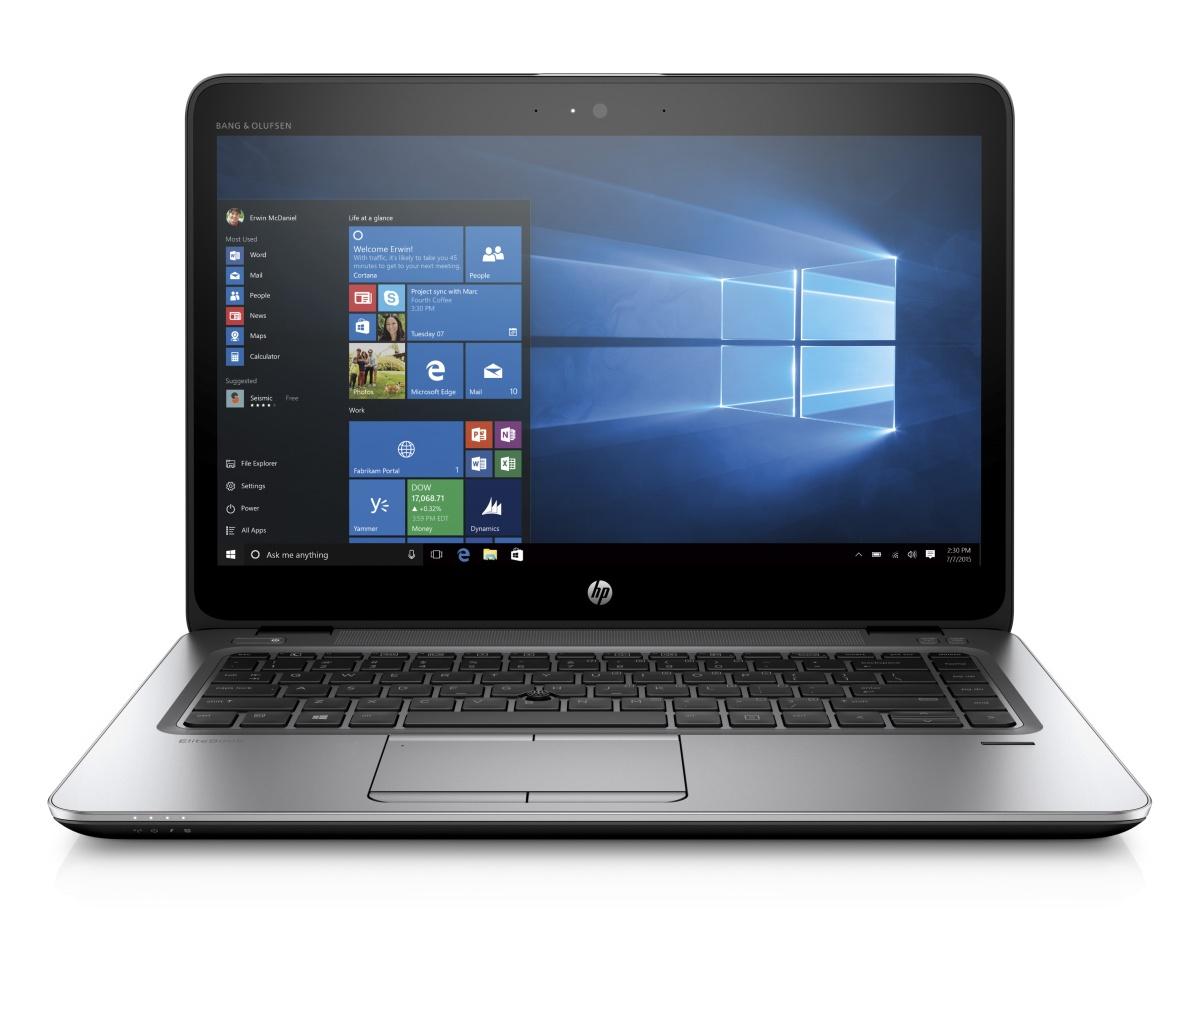 "HP EliteBook 840 G3 i7-6500U/8GB/256GB SSD/14"" FHD/ backlit keyb /Win 10 Pro downgraded"